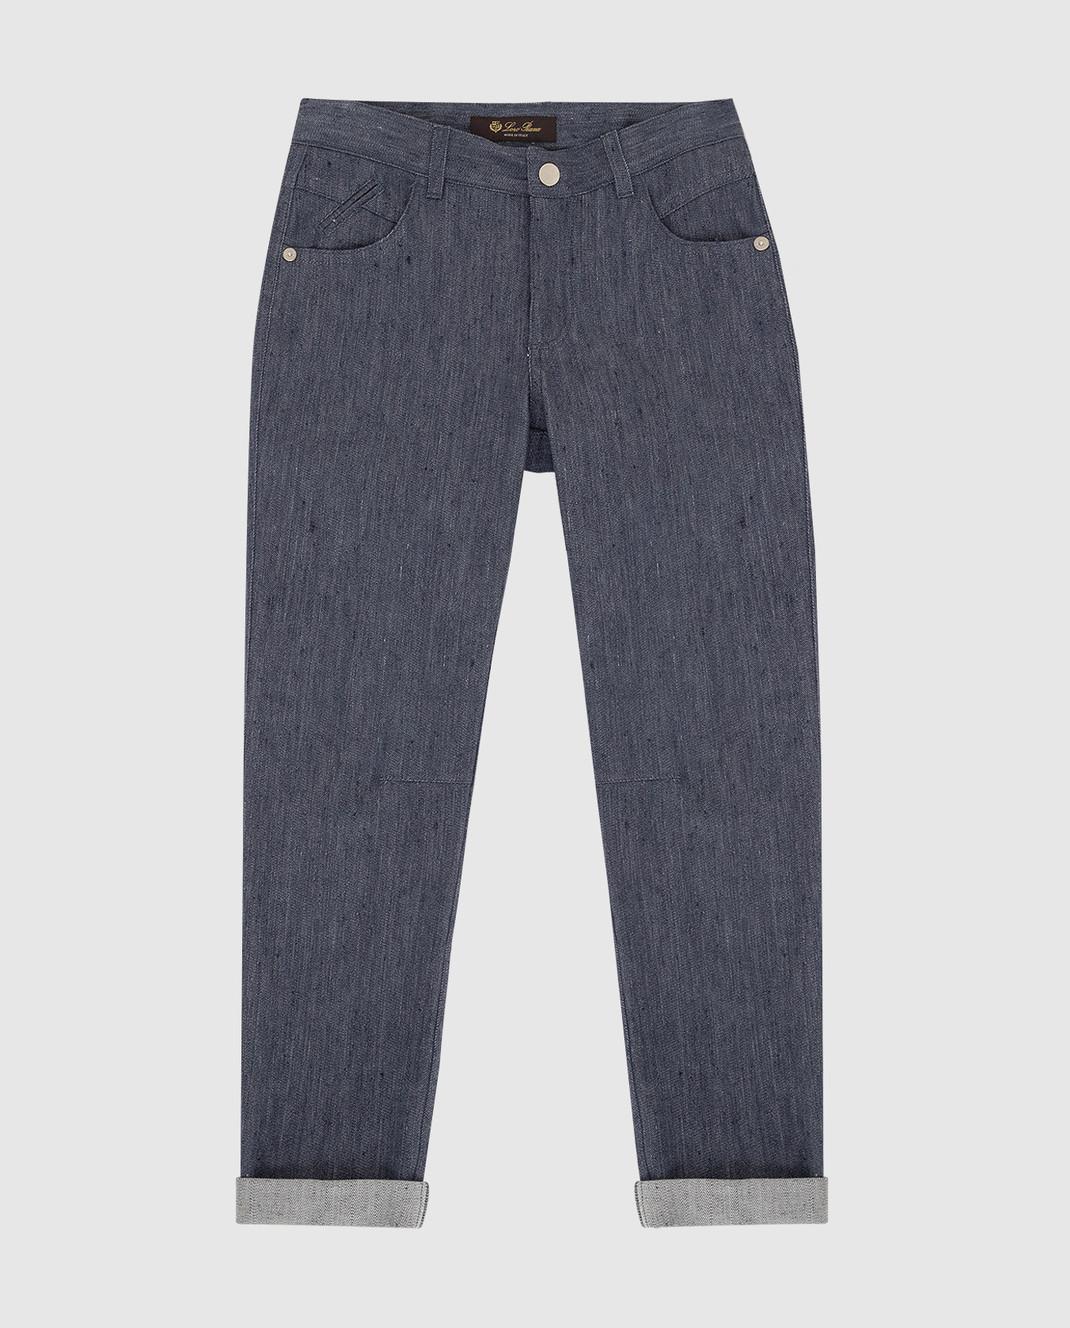 Loro Piana Детские темно-синие джинсы F1FAI0810